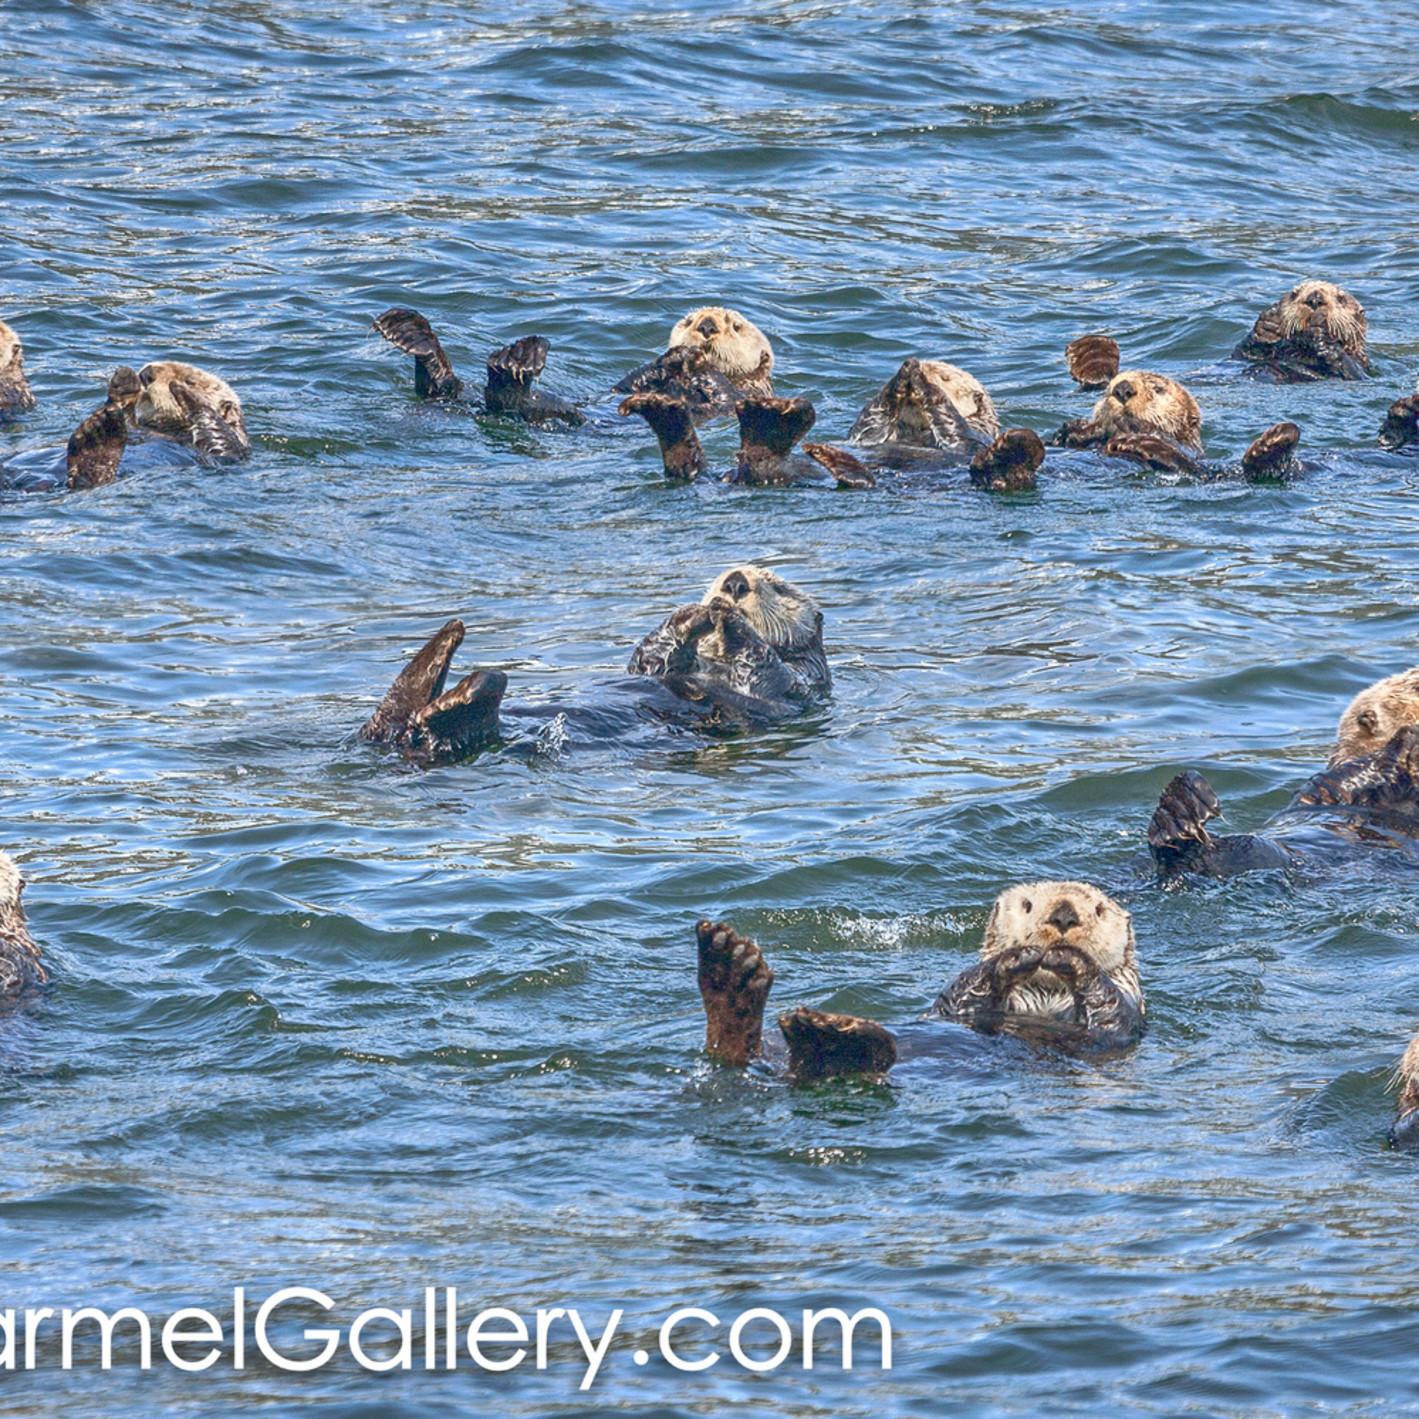 Sea otter swim cf4xs5